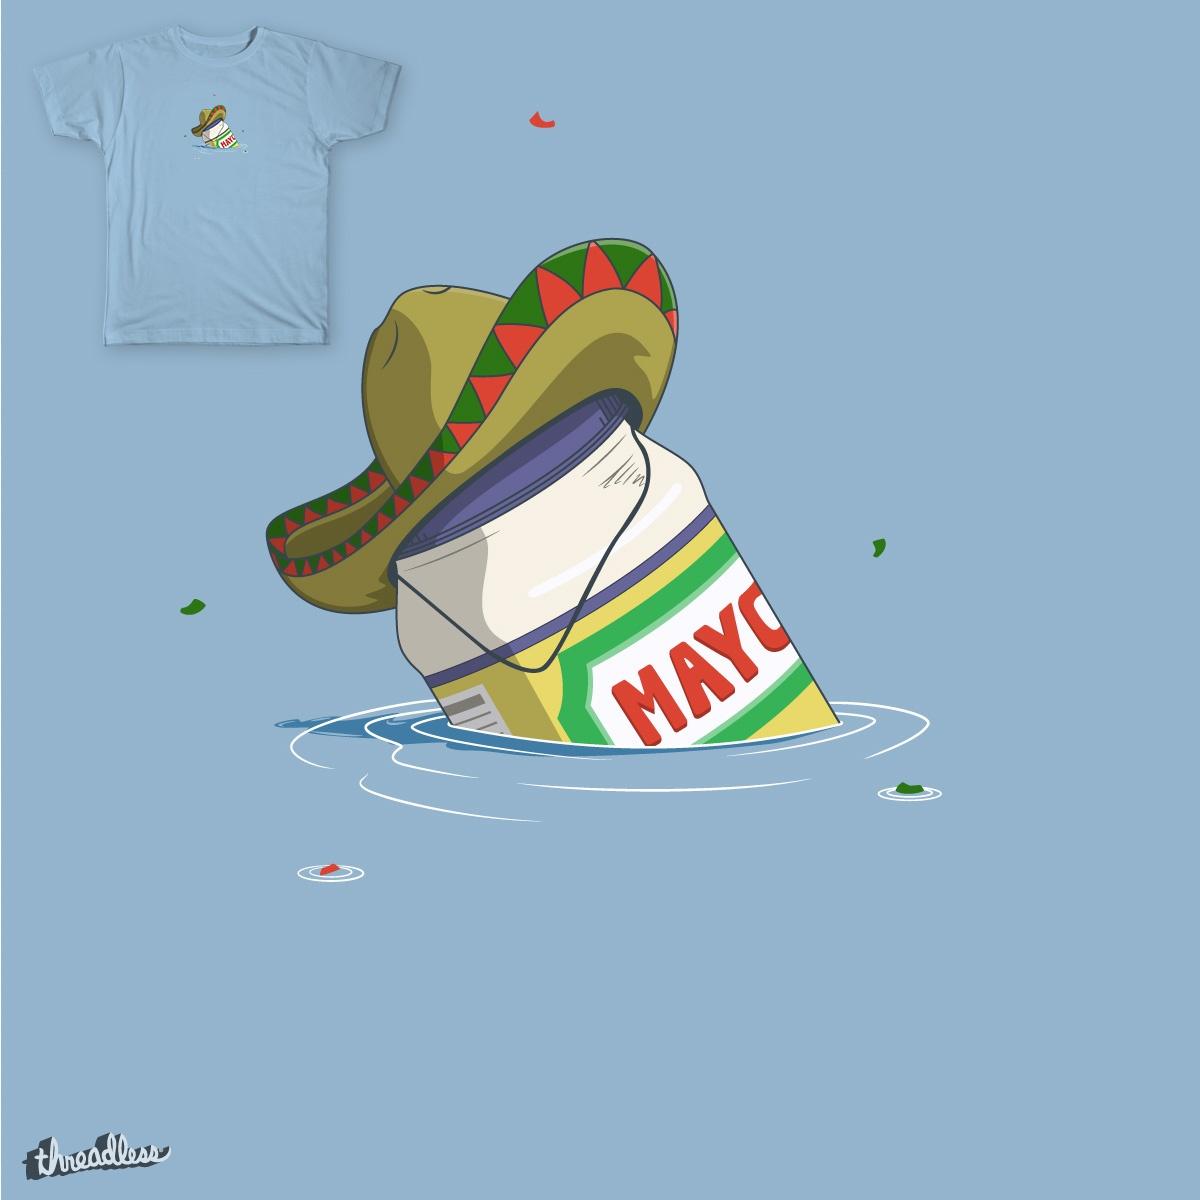 Score Sink-o De Mayo by wilbury on Threadless